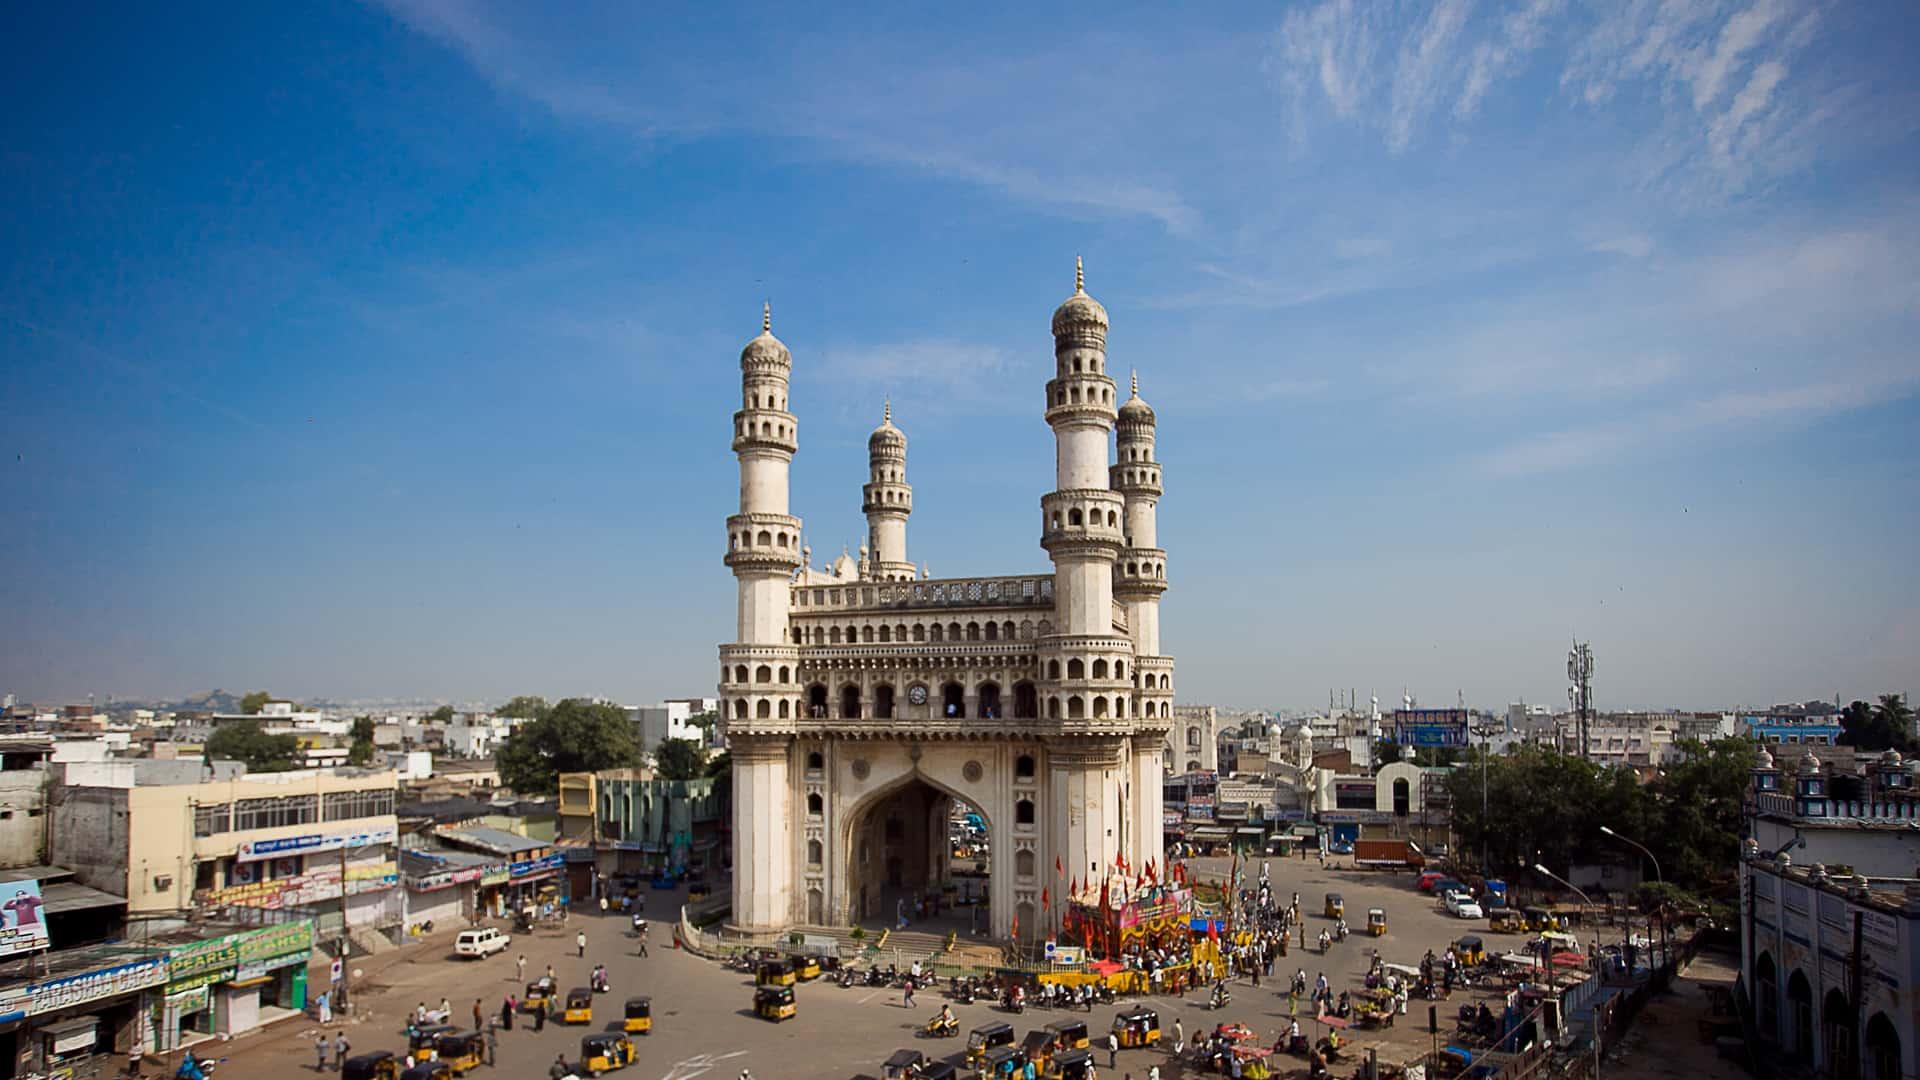 Chaar Minar, Hyderabad चारमीनार, हैदराबाद